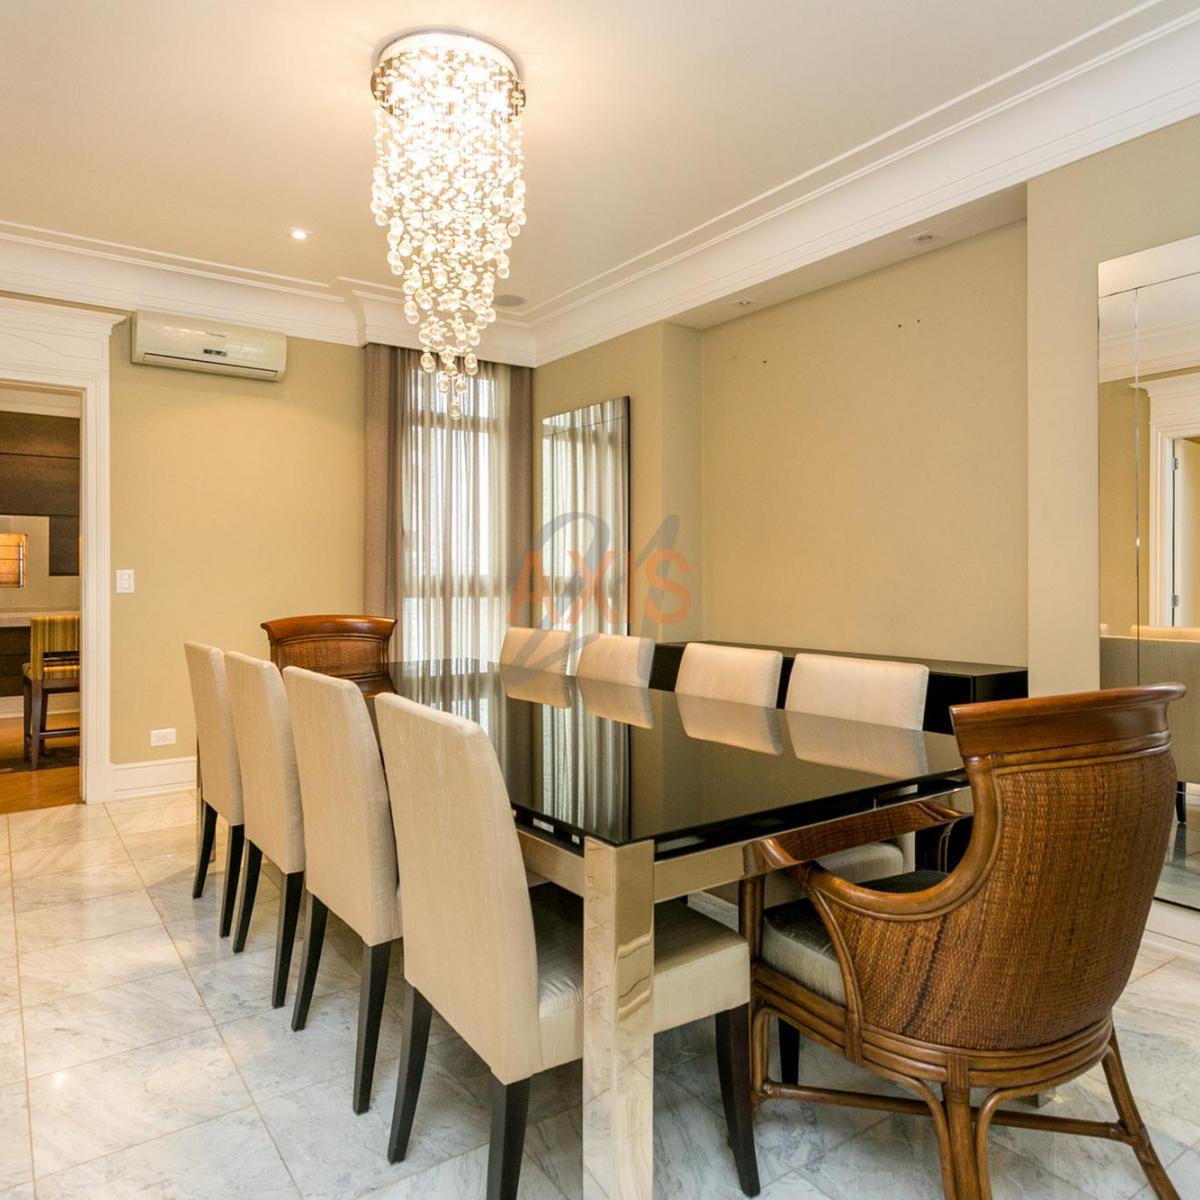 http://www.infocenterhost2.com.br/crm/fotosimovel/202507/59785493-apartamento-curitiba-batel_marcadagua.jpg